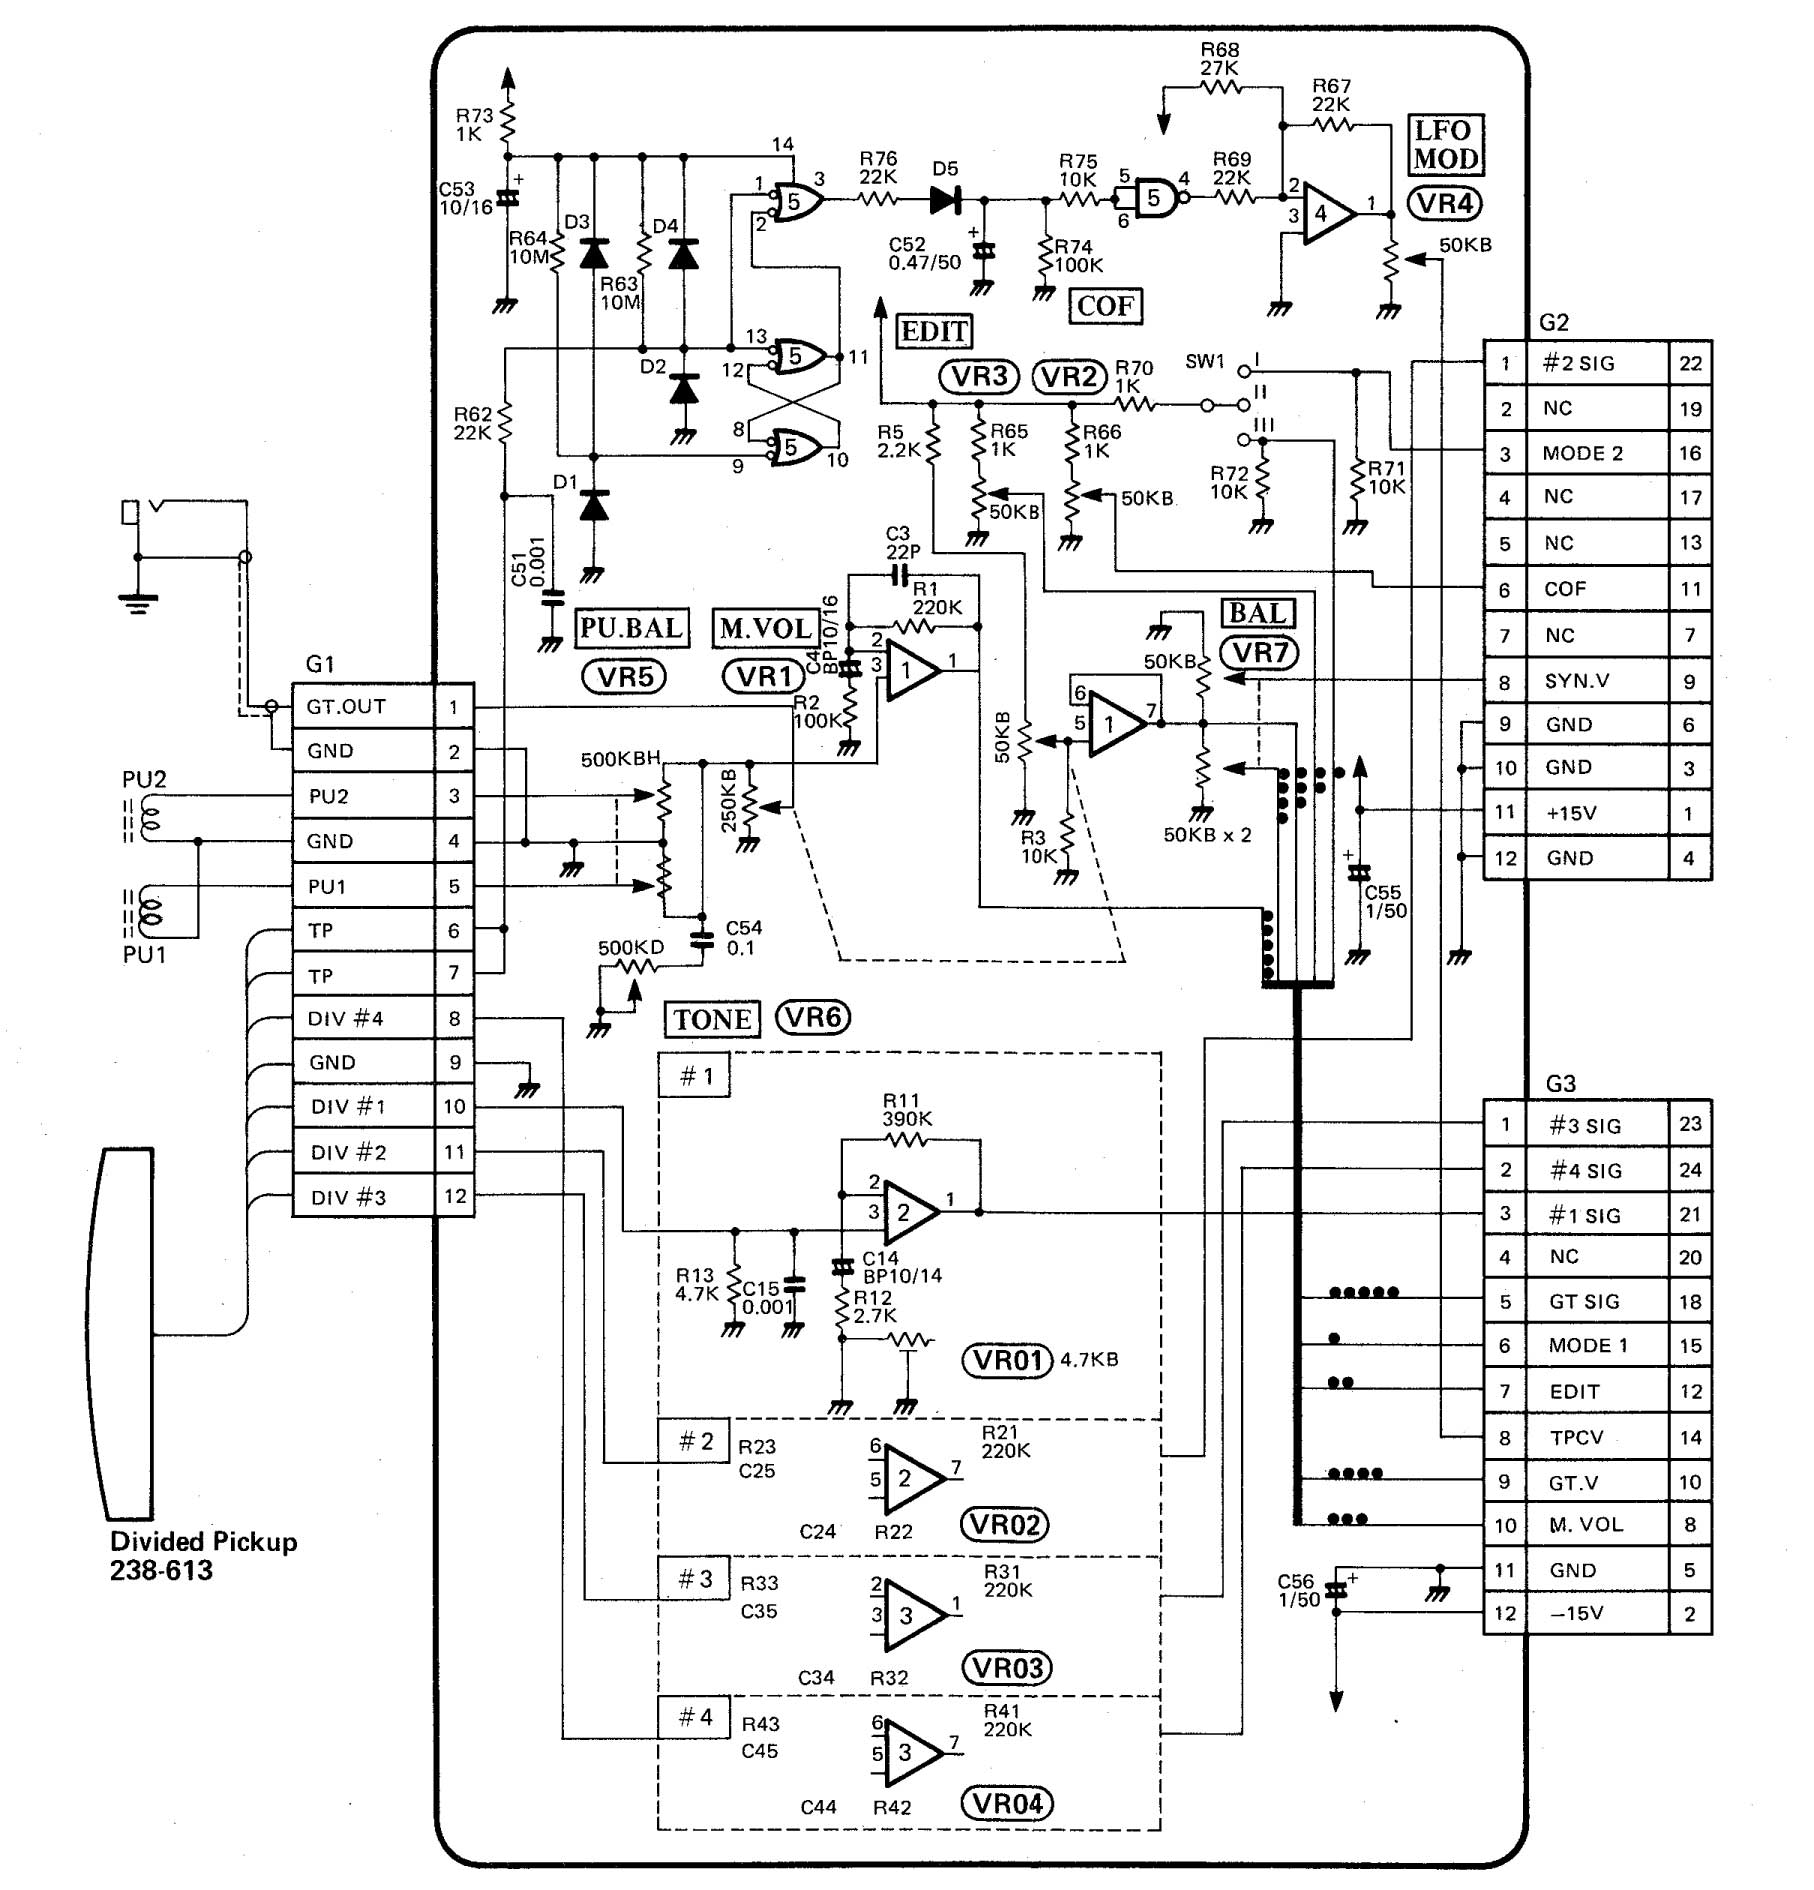 vz cooling fan wiring diagram 3 circle venn graphic organizer honda insight fuse box electrical diagrams